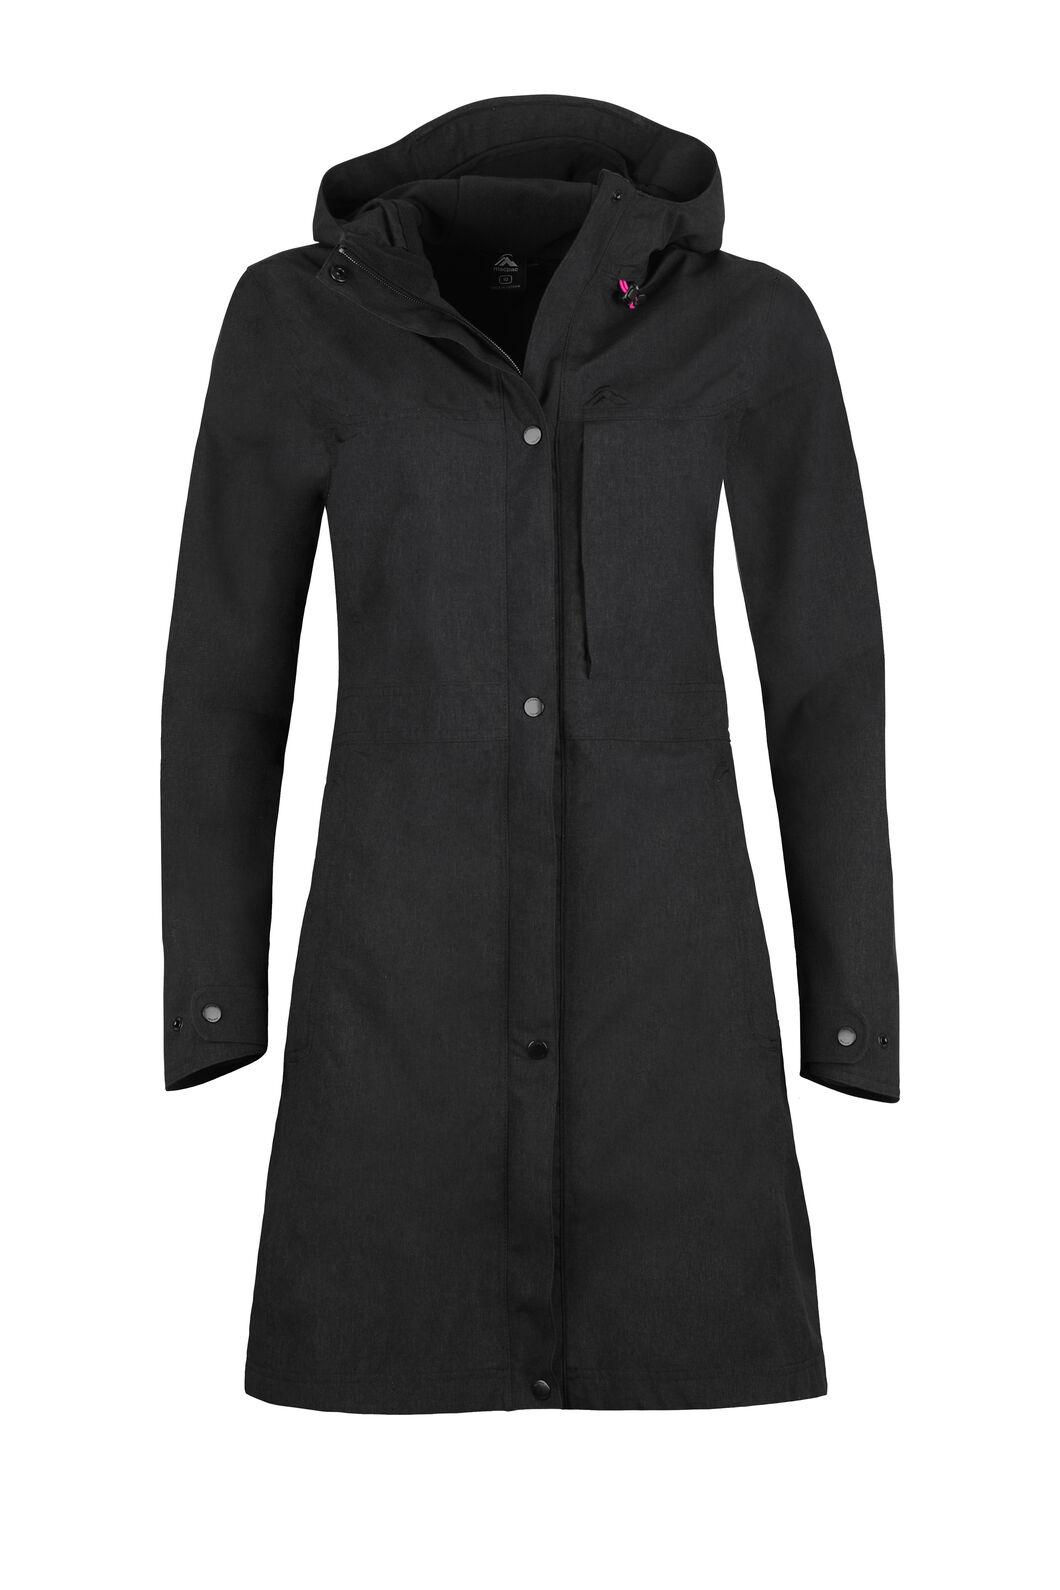 Macpac Torrent Jacket - Women's, Black, hi-res